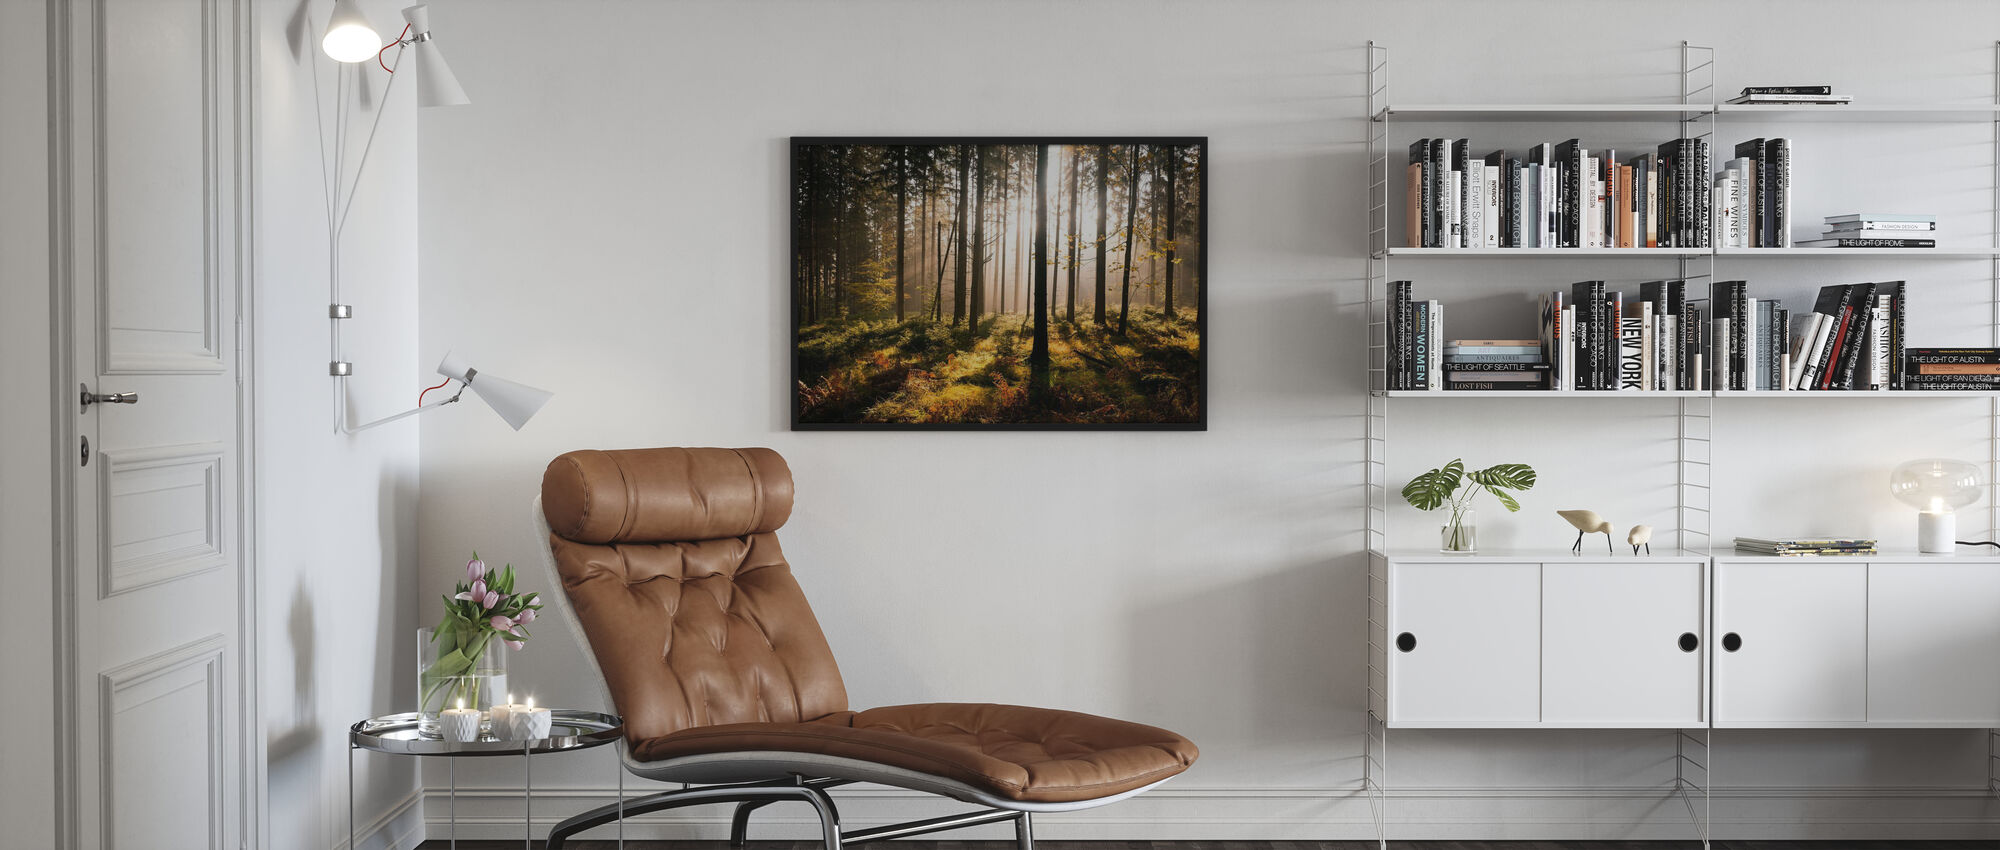 Herfst bos met zonnestralen - Ingelijste print - Woonkamer